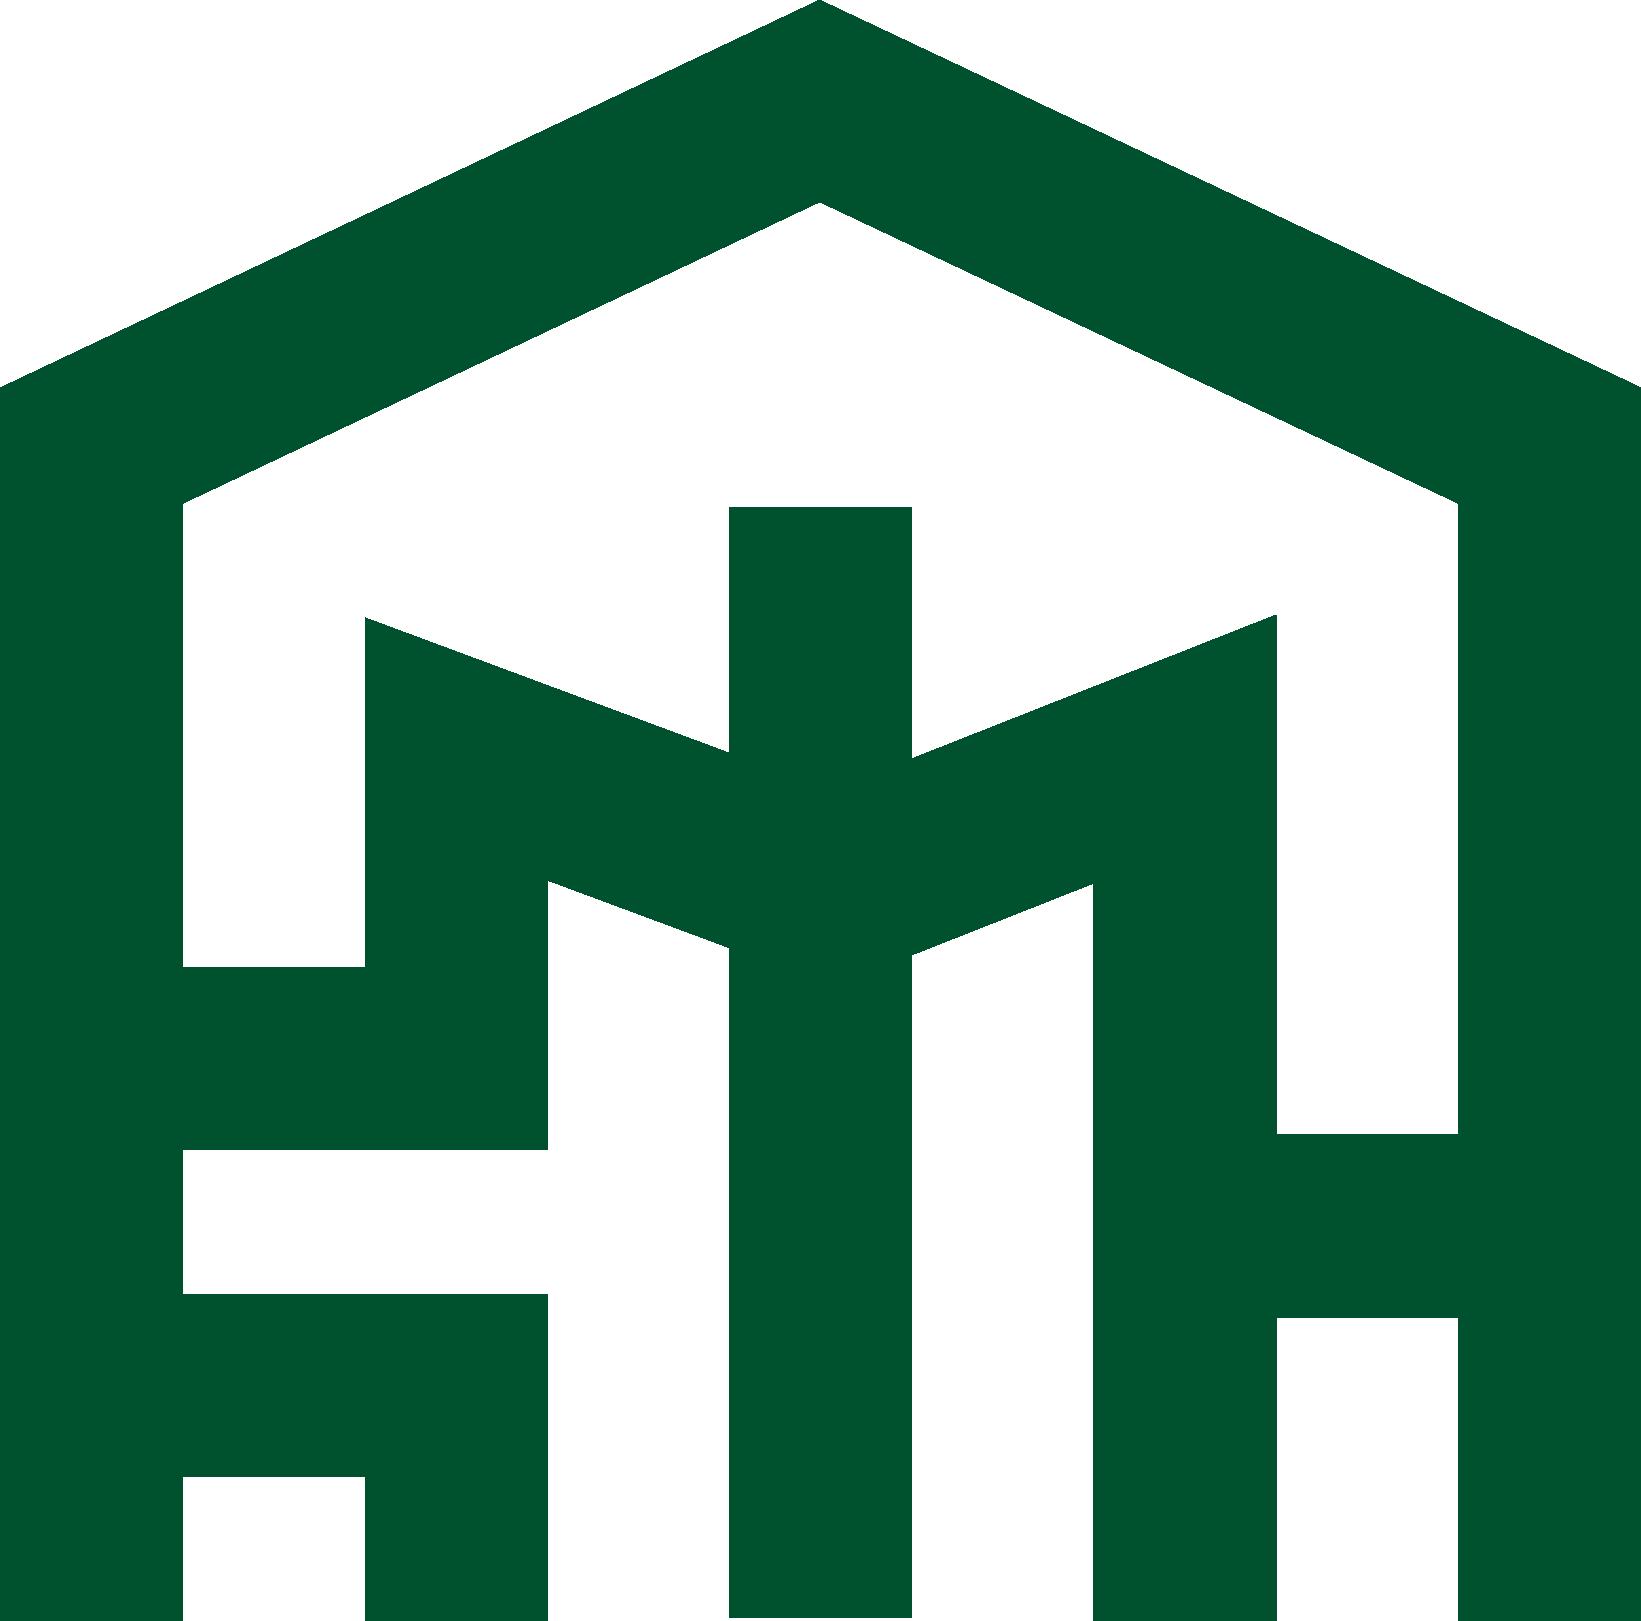 外部サービス利用型共同生活援助